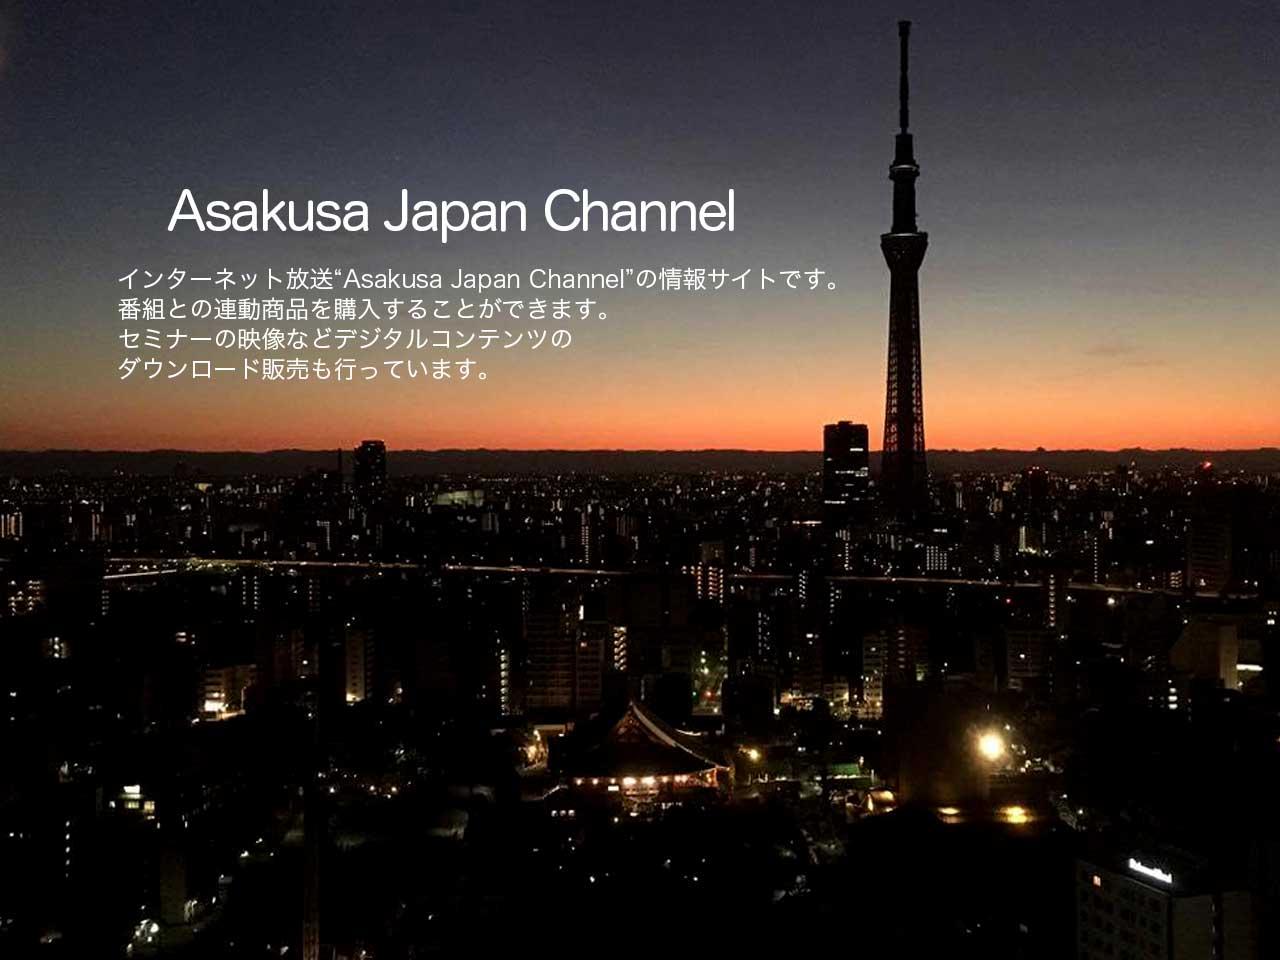 Asakusa Japan Channel